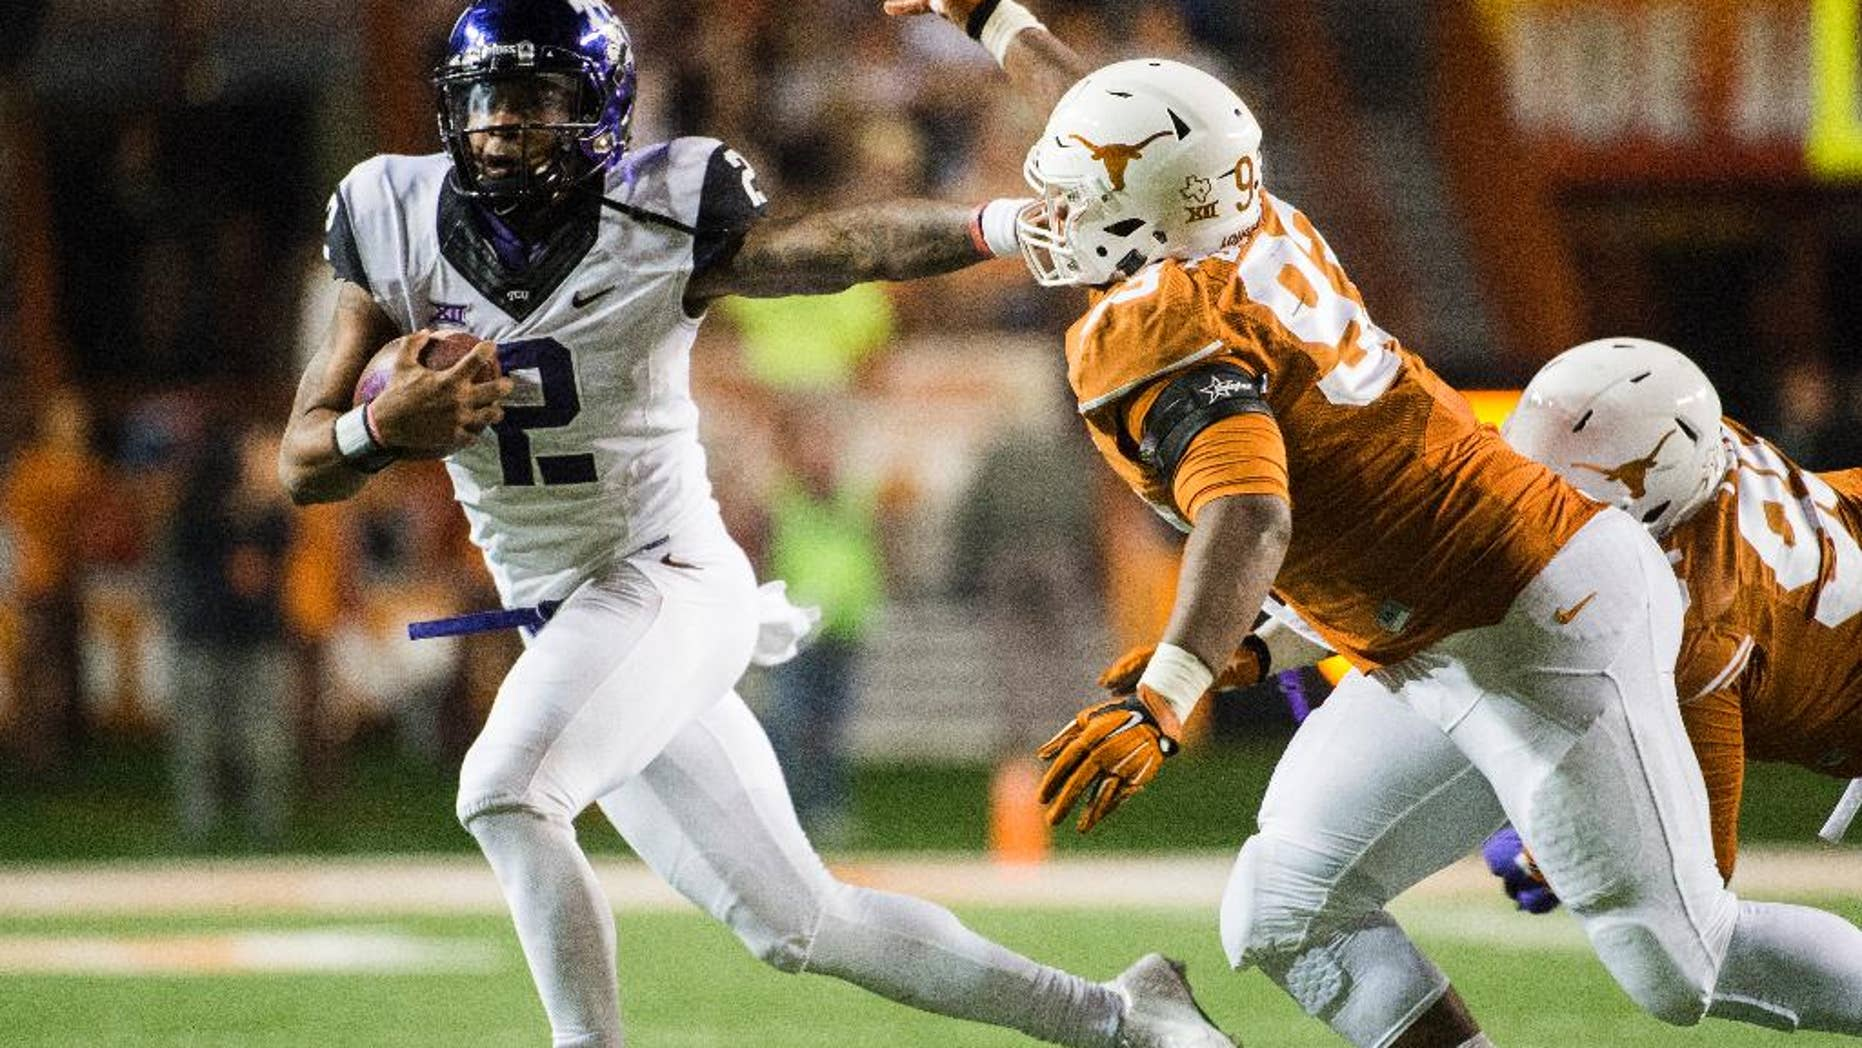 CORRECTS NAME OF TCU PLAYER TO TREVONE BOYKIN -  TCU's Trevone Boykin (2) holds off Texas' Paul Boyette Jr. (93) during the second half of an NCAA college football game, Thursday, Nov. 27, 2014, in Austin, Texas. (AP Photo/Ashley Landis)